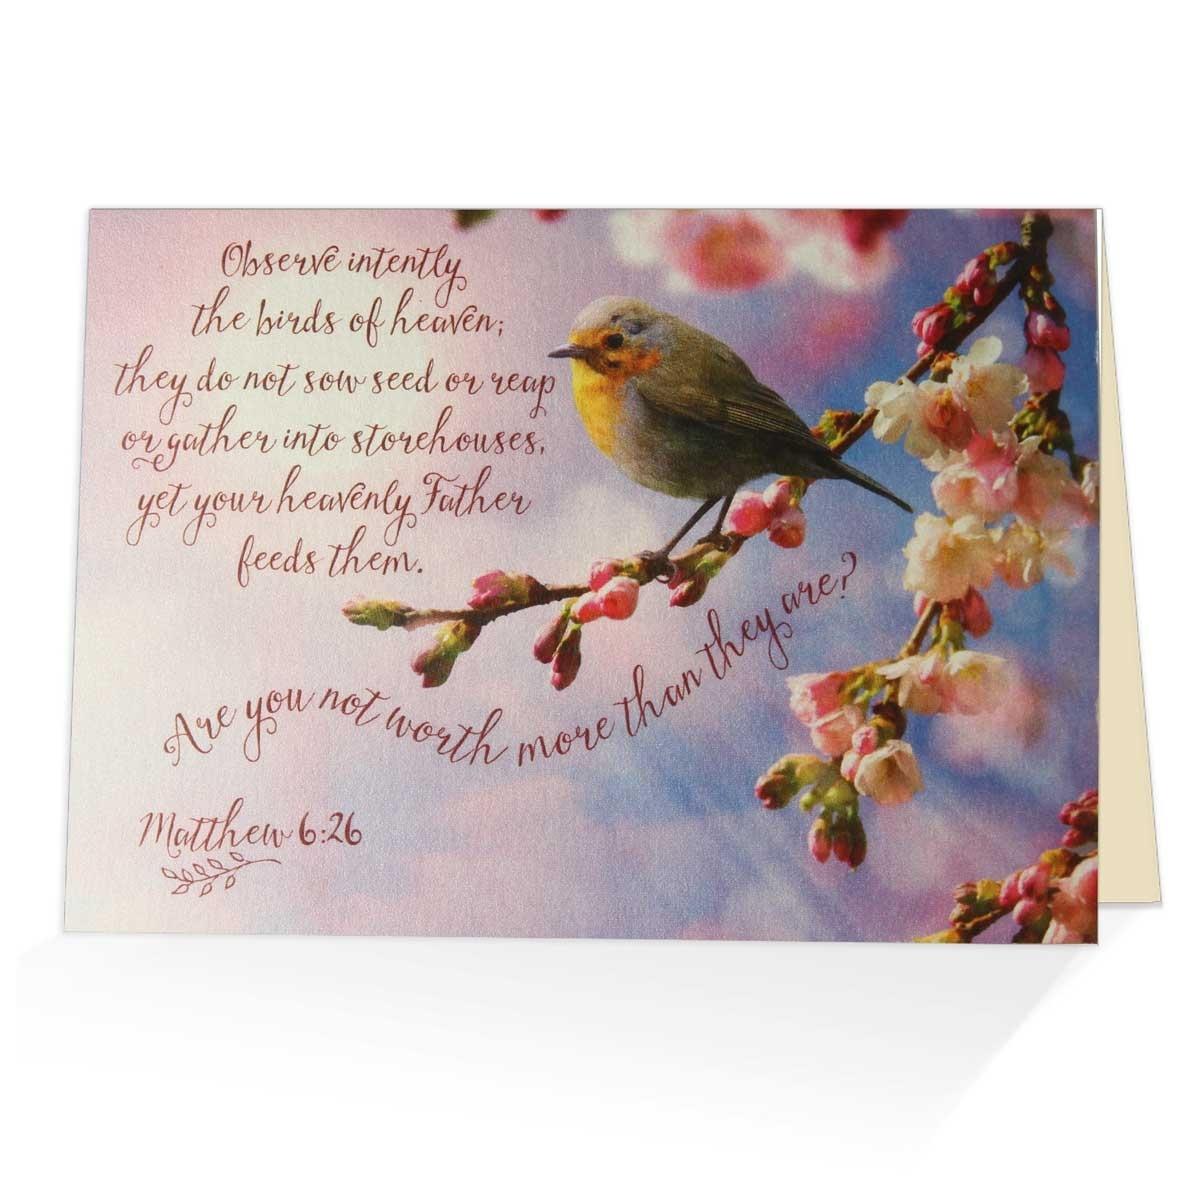 Matthew 626 Greeting Card Biblical Encouragement Card